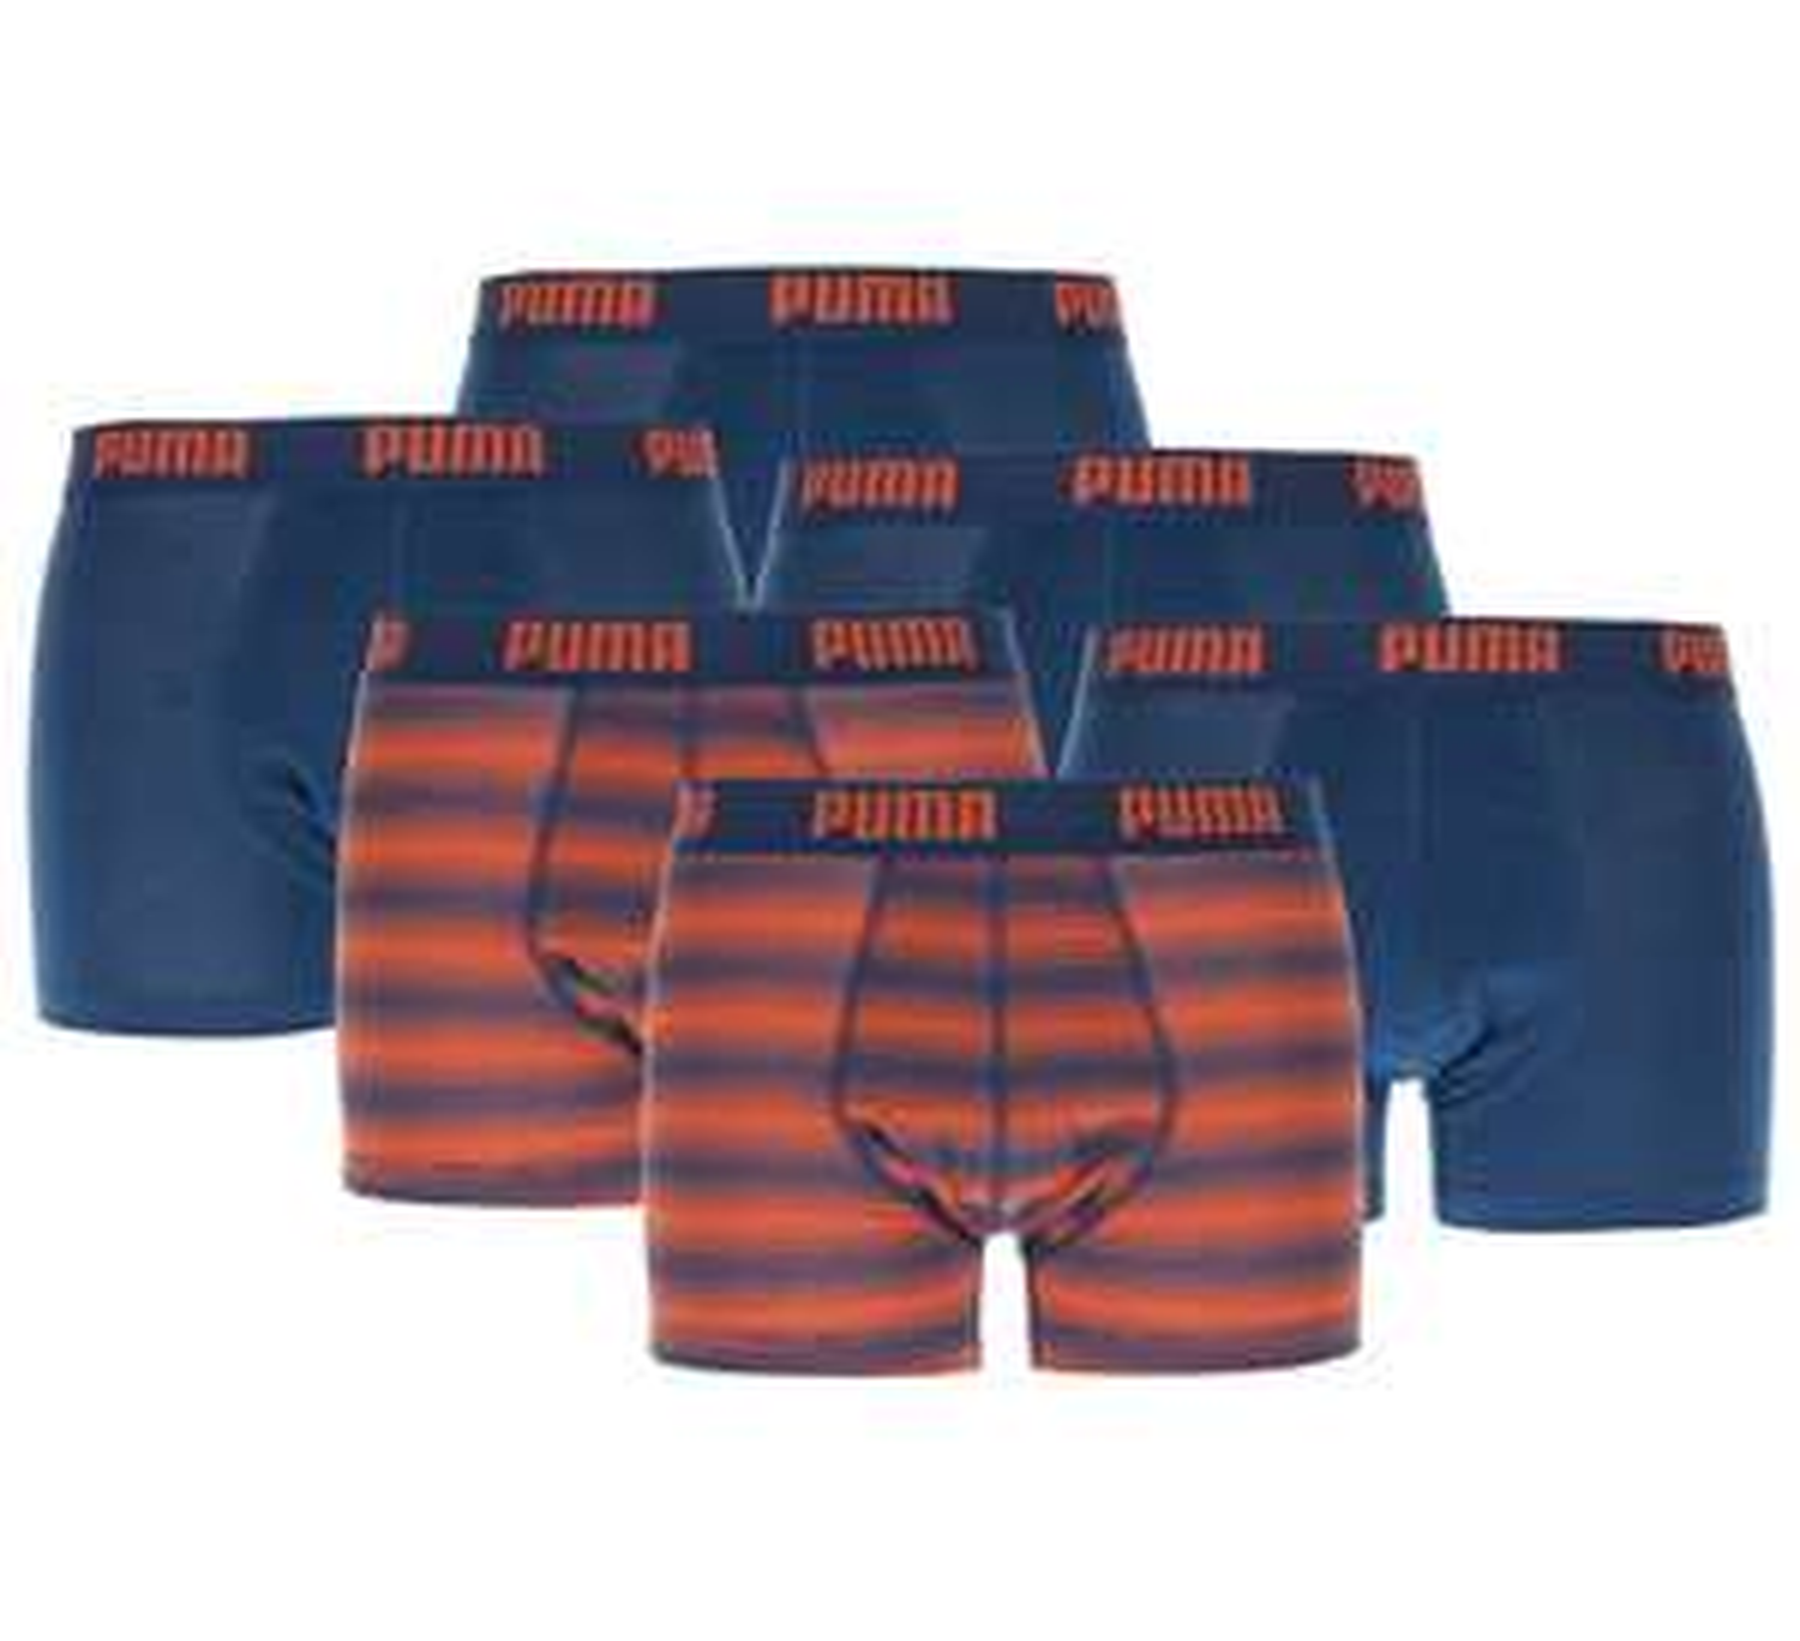 2, 3 of 6 pak Puma / Bjorn Borg/ Calvin Klein / Armani boxershorts & slips @ Plutosport